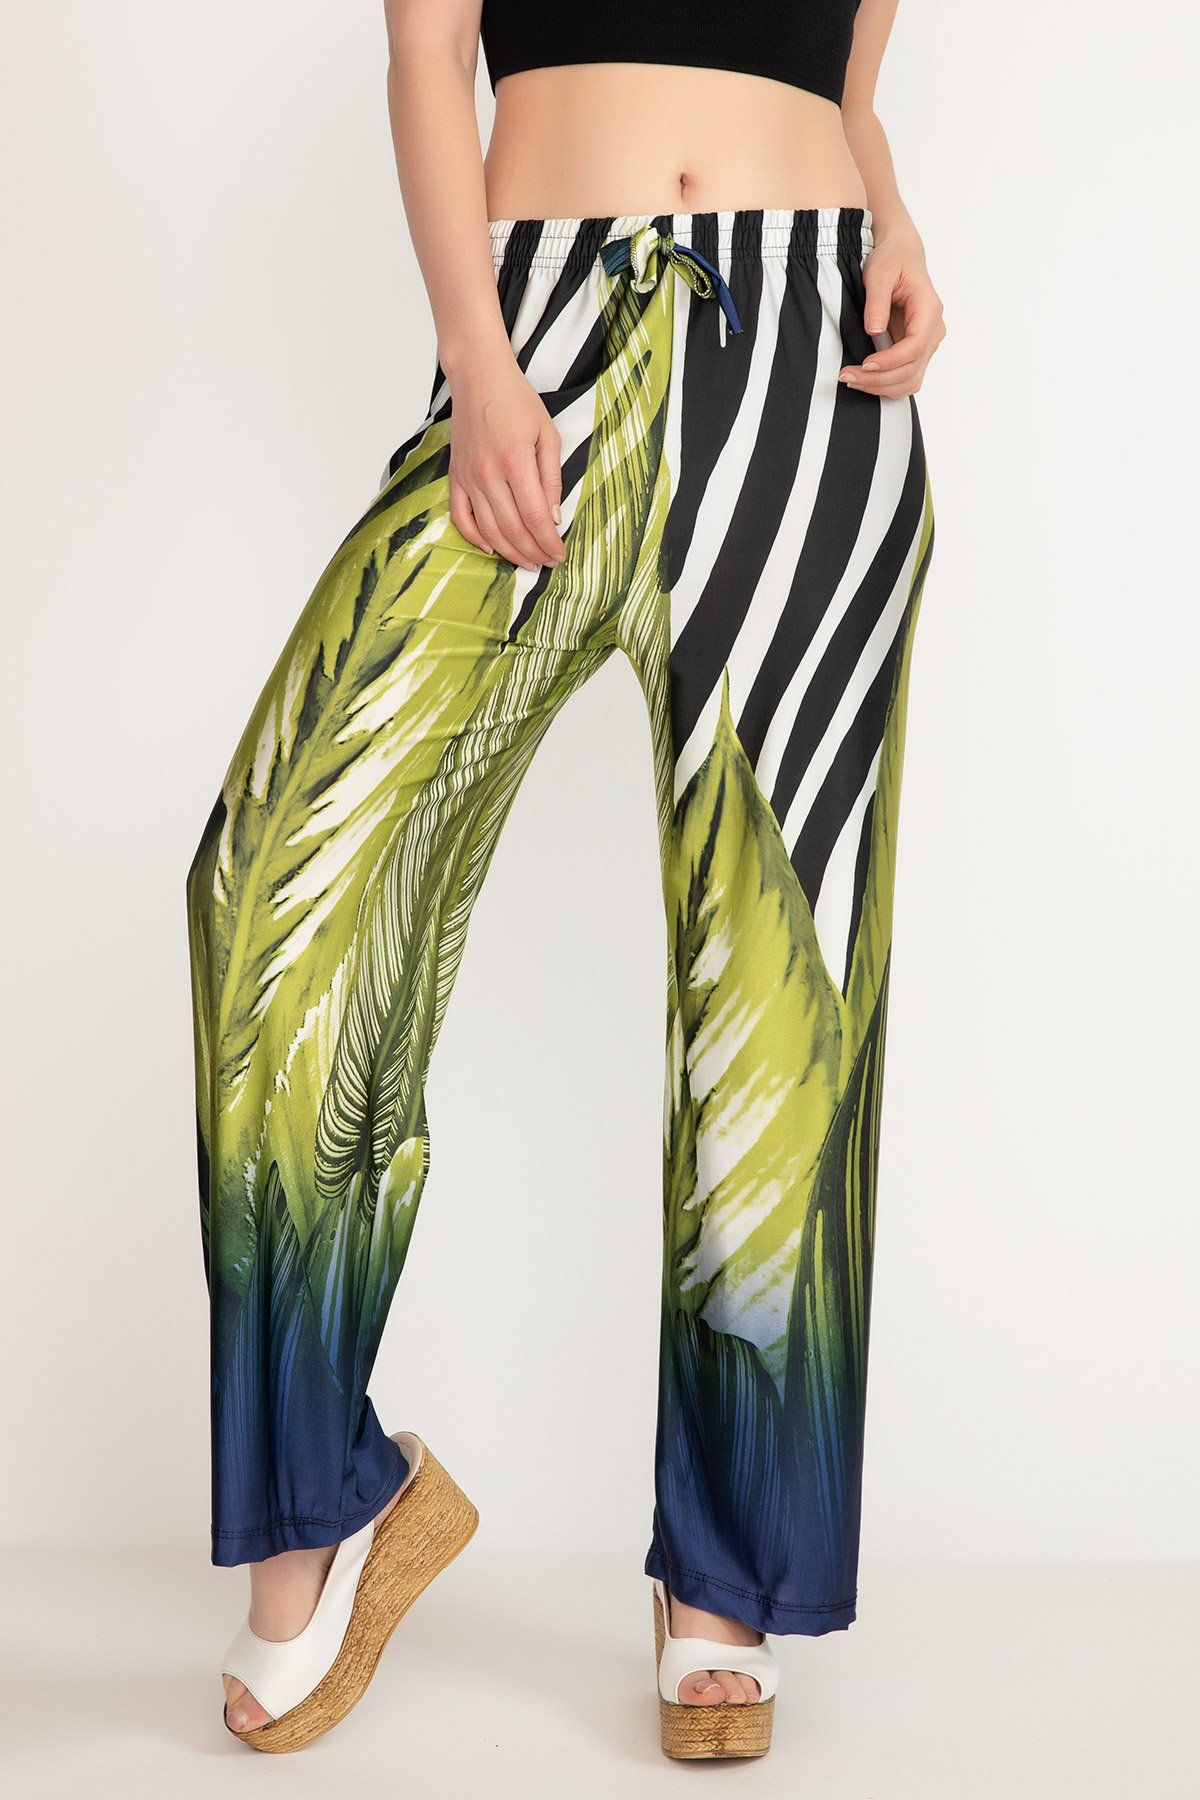 Straight Pants-Multi color